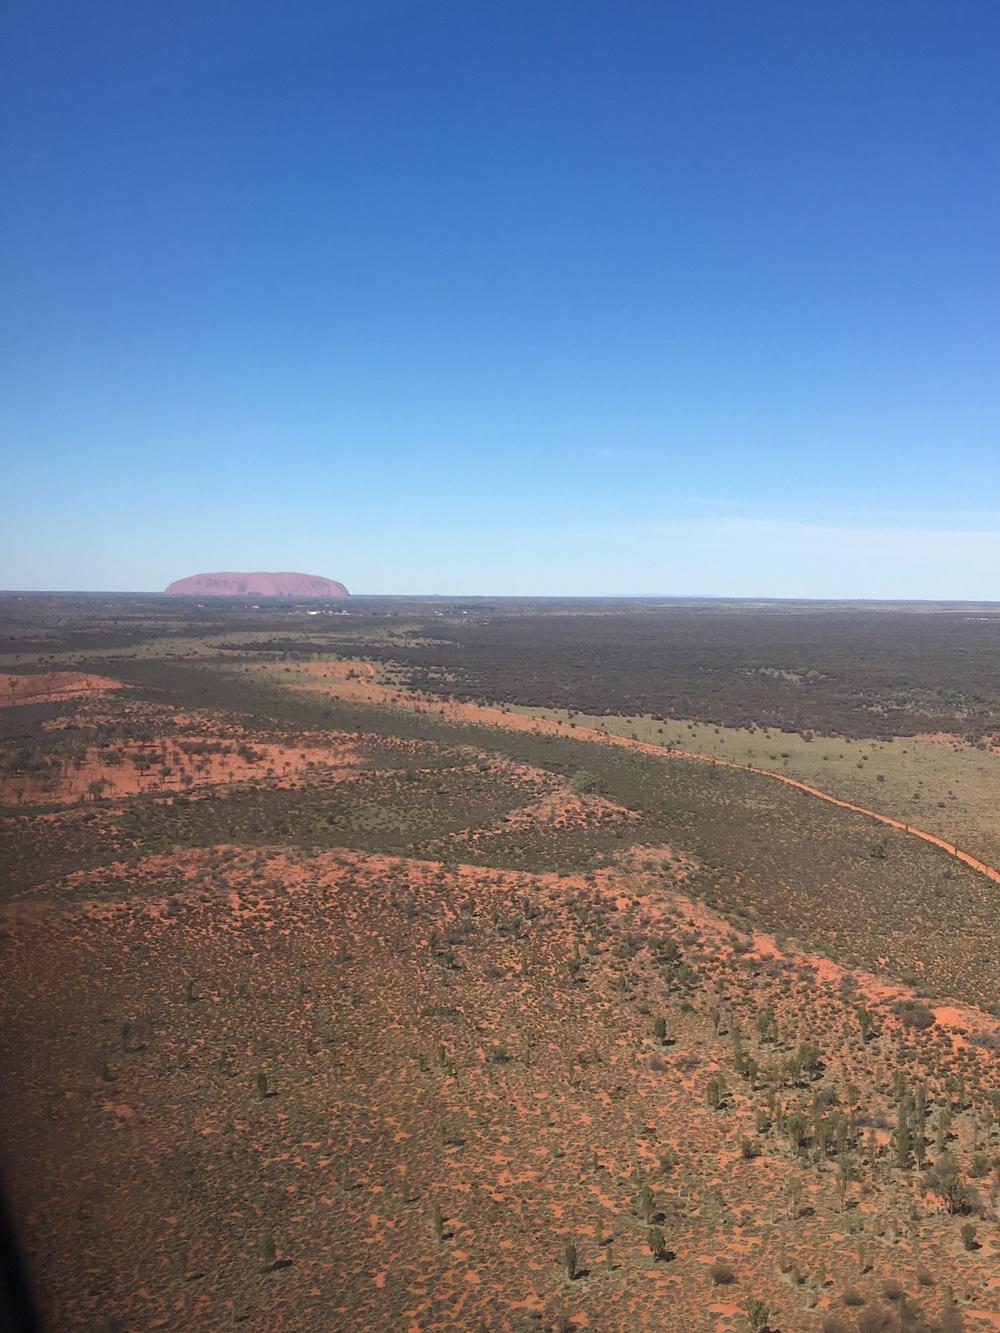 And Uluru